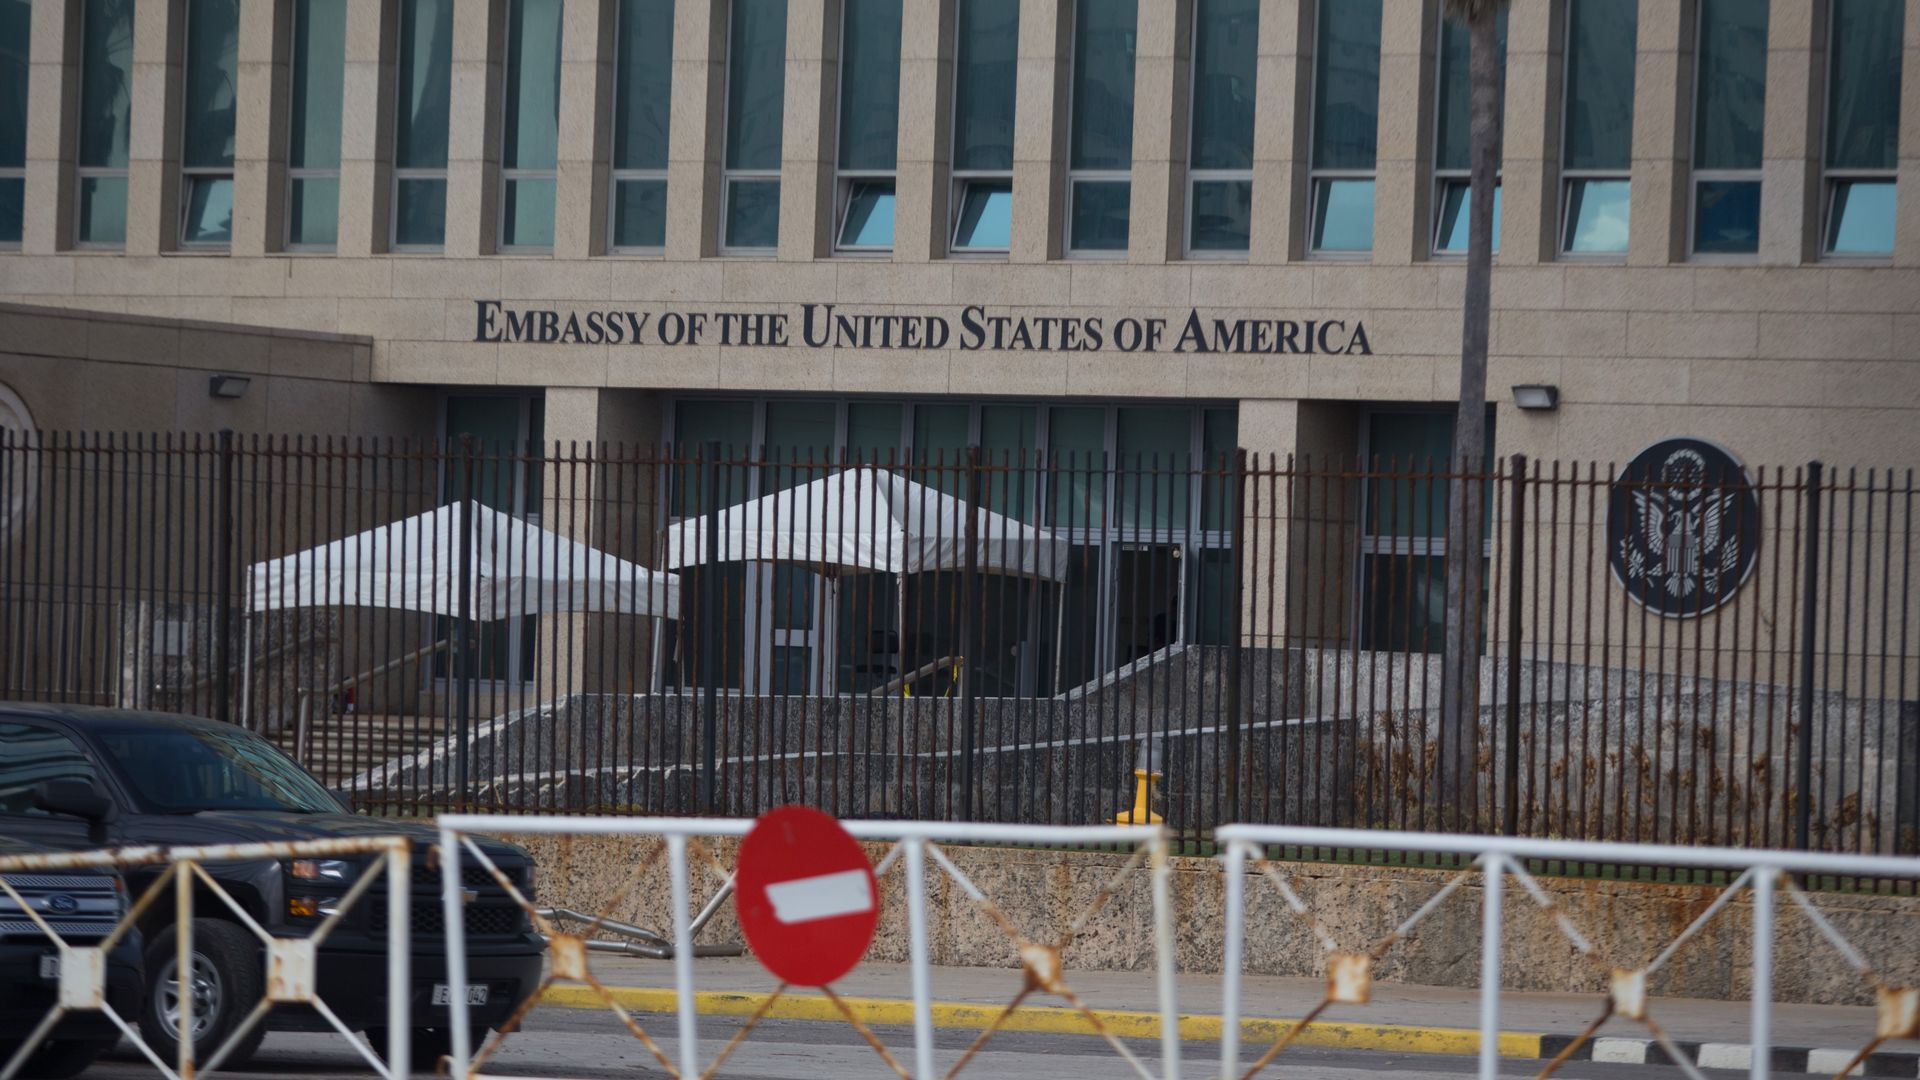 View of U.S. embassy in Cuba